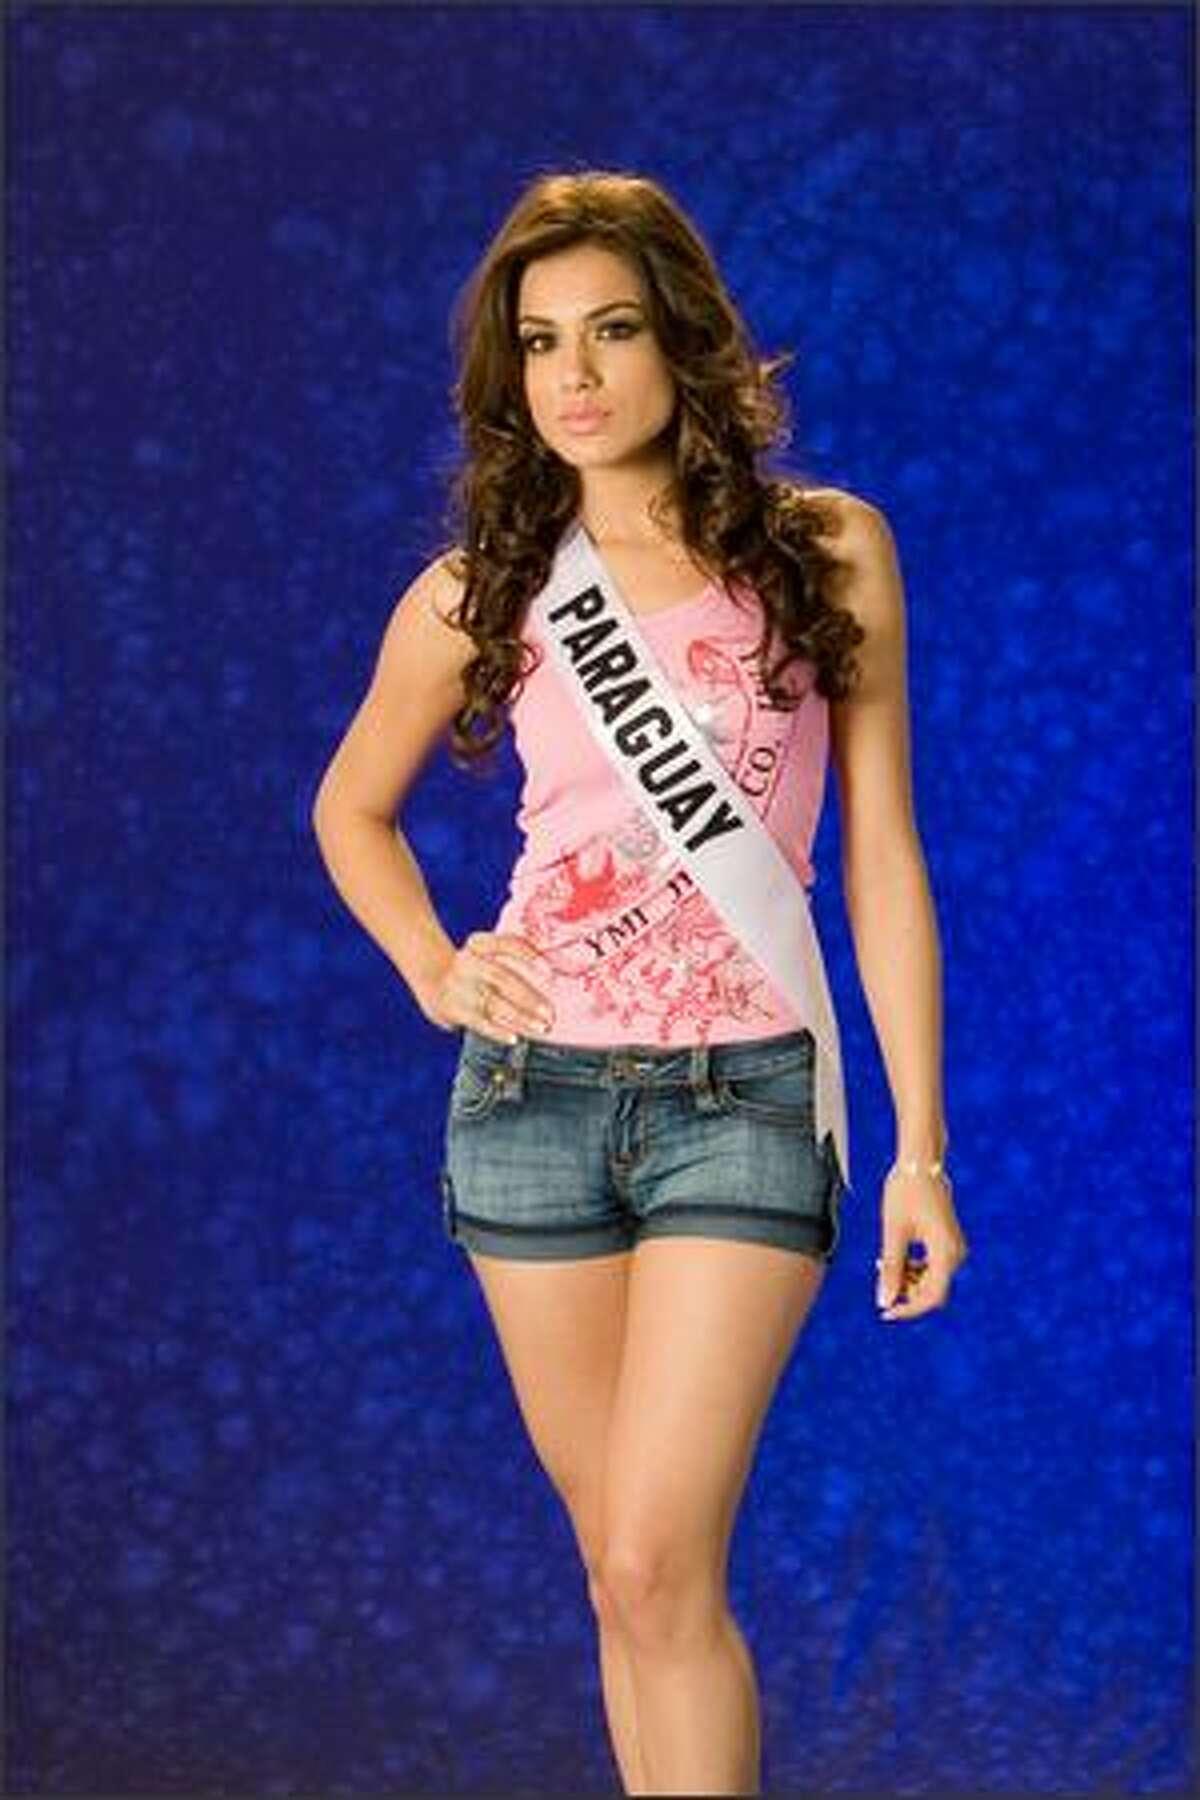 Maria Jose Maldonado Gomez, Miss Paraguay 2007.